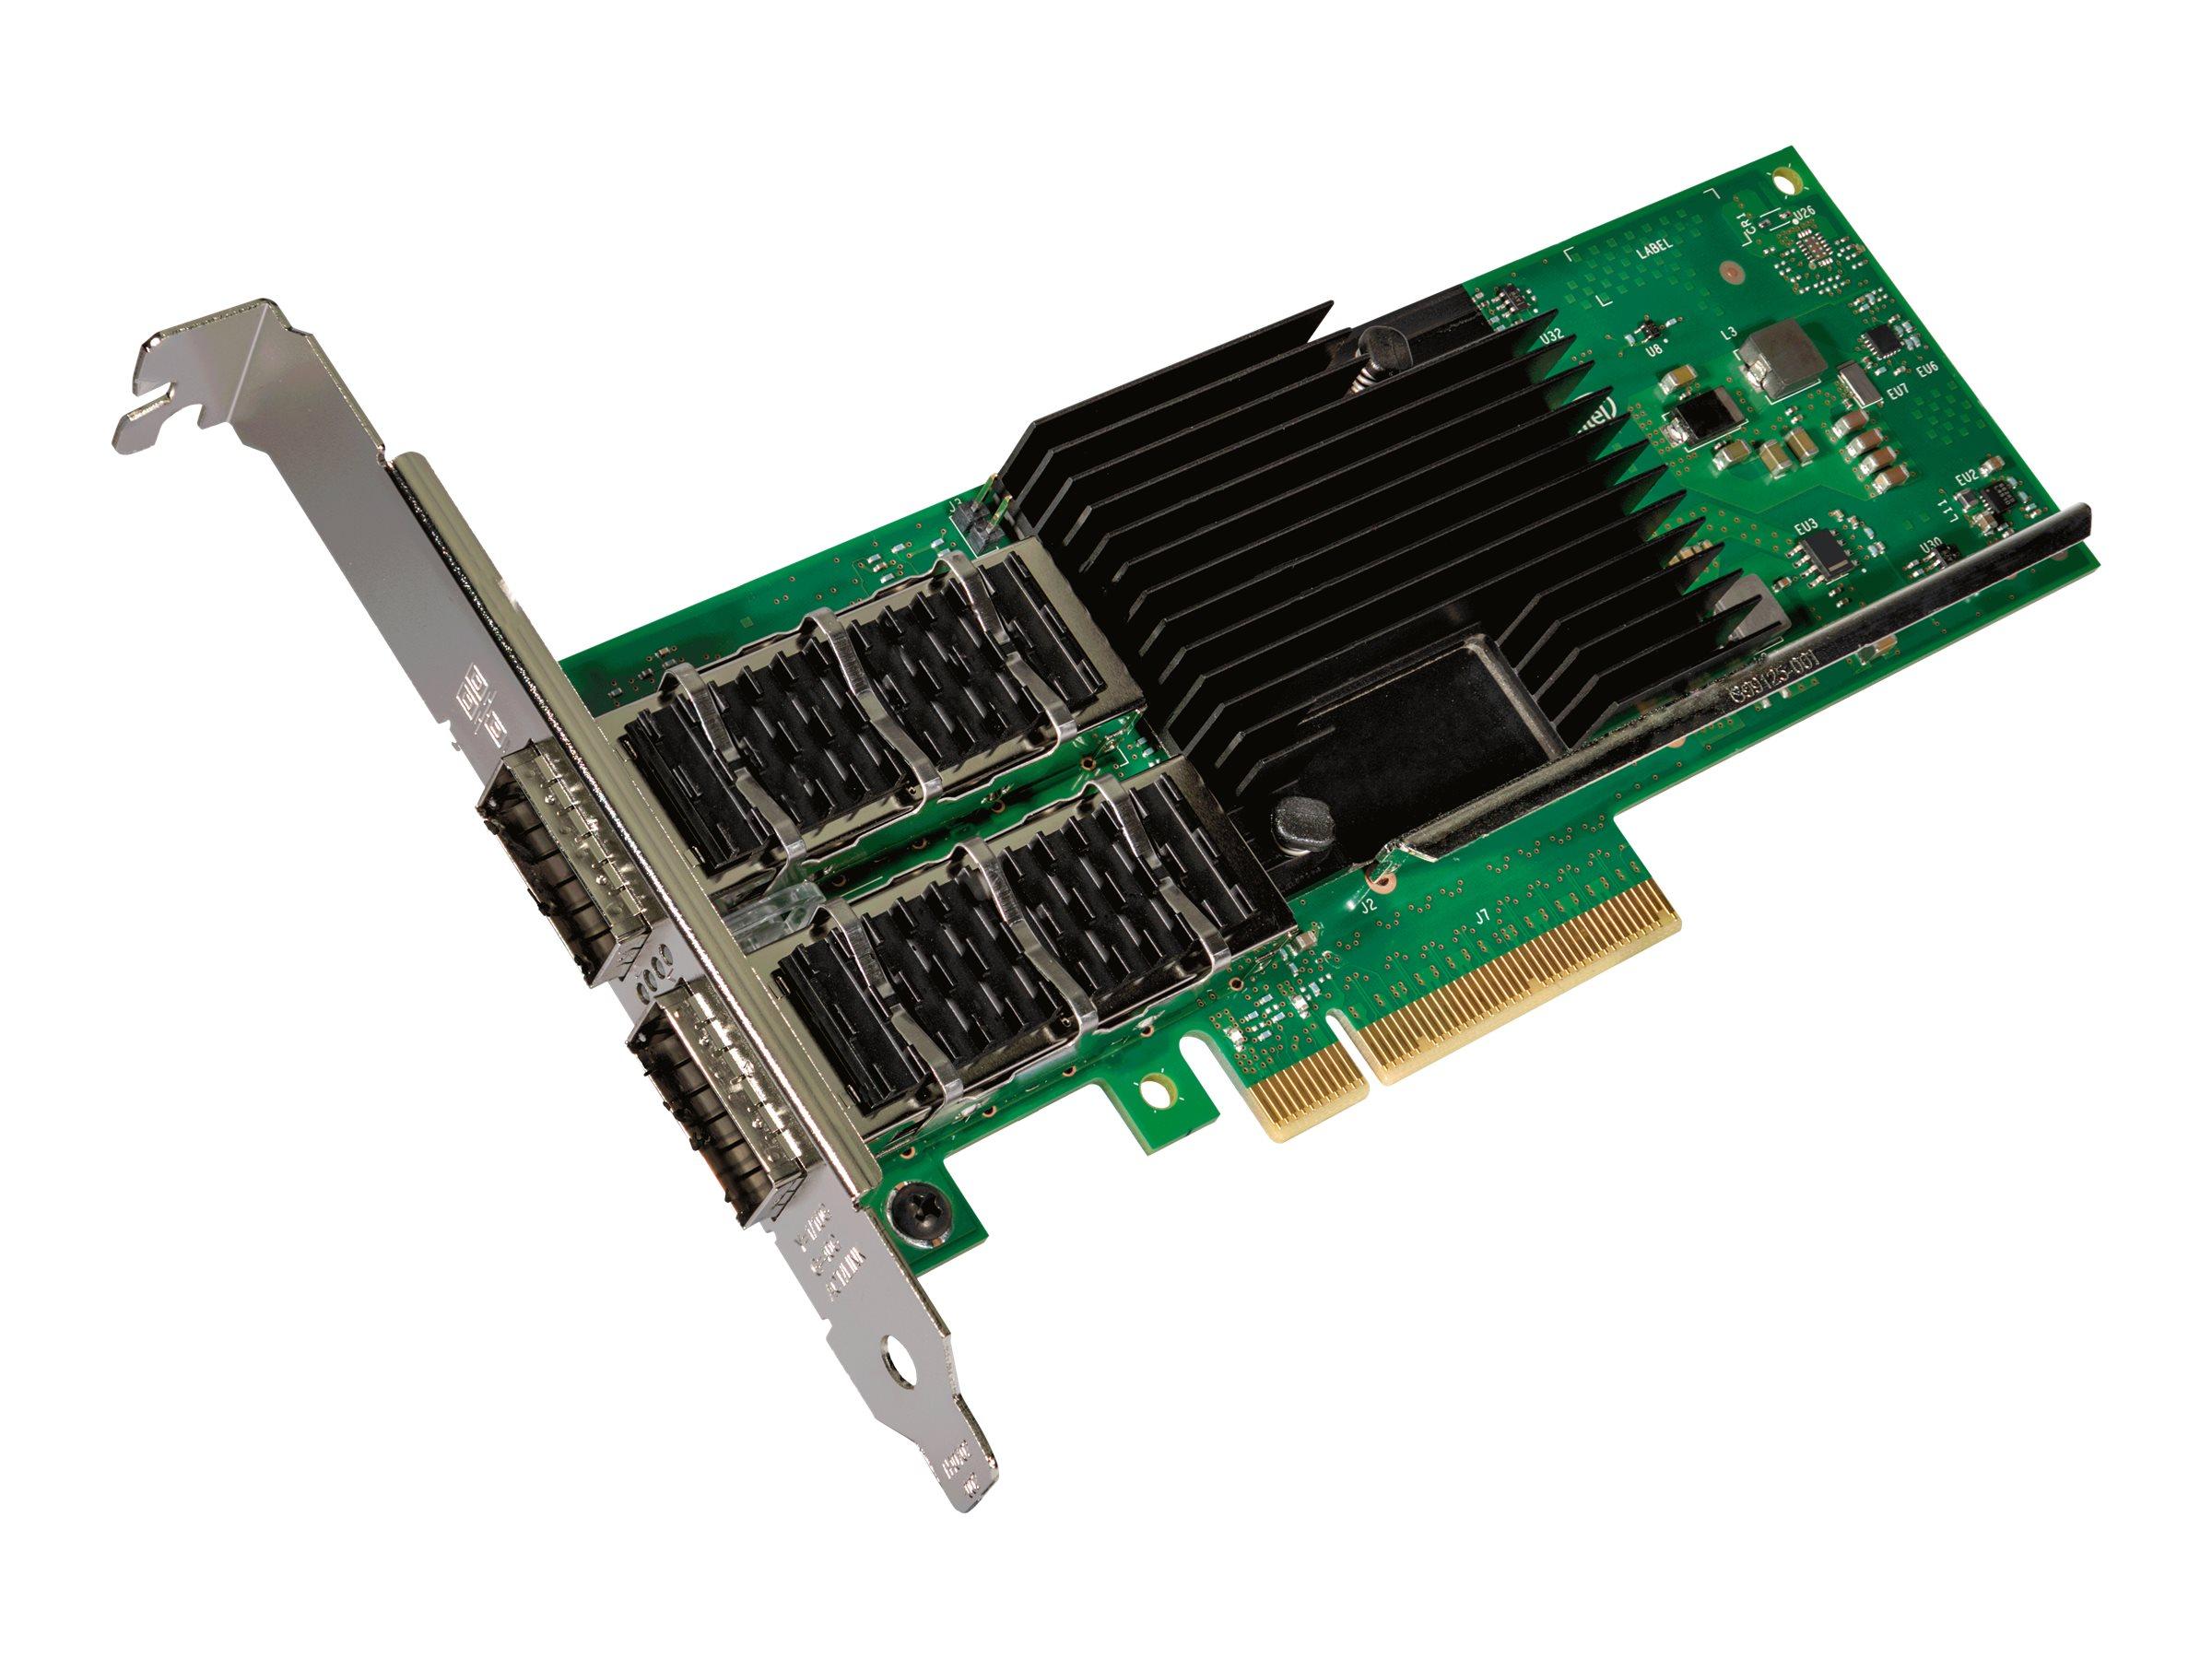 Intel Ethernet Converged Network Adapter XL710-QDA2 - Netzwerkadapter - PCIe 3.0 x8 Low-Profile - 40 Gigabit QSFP+ x 2